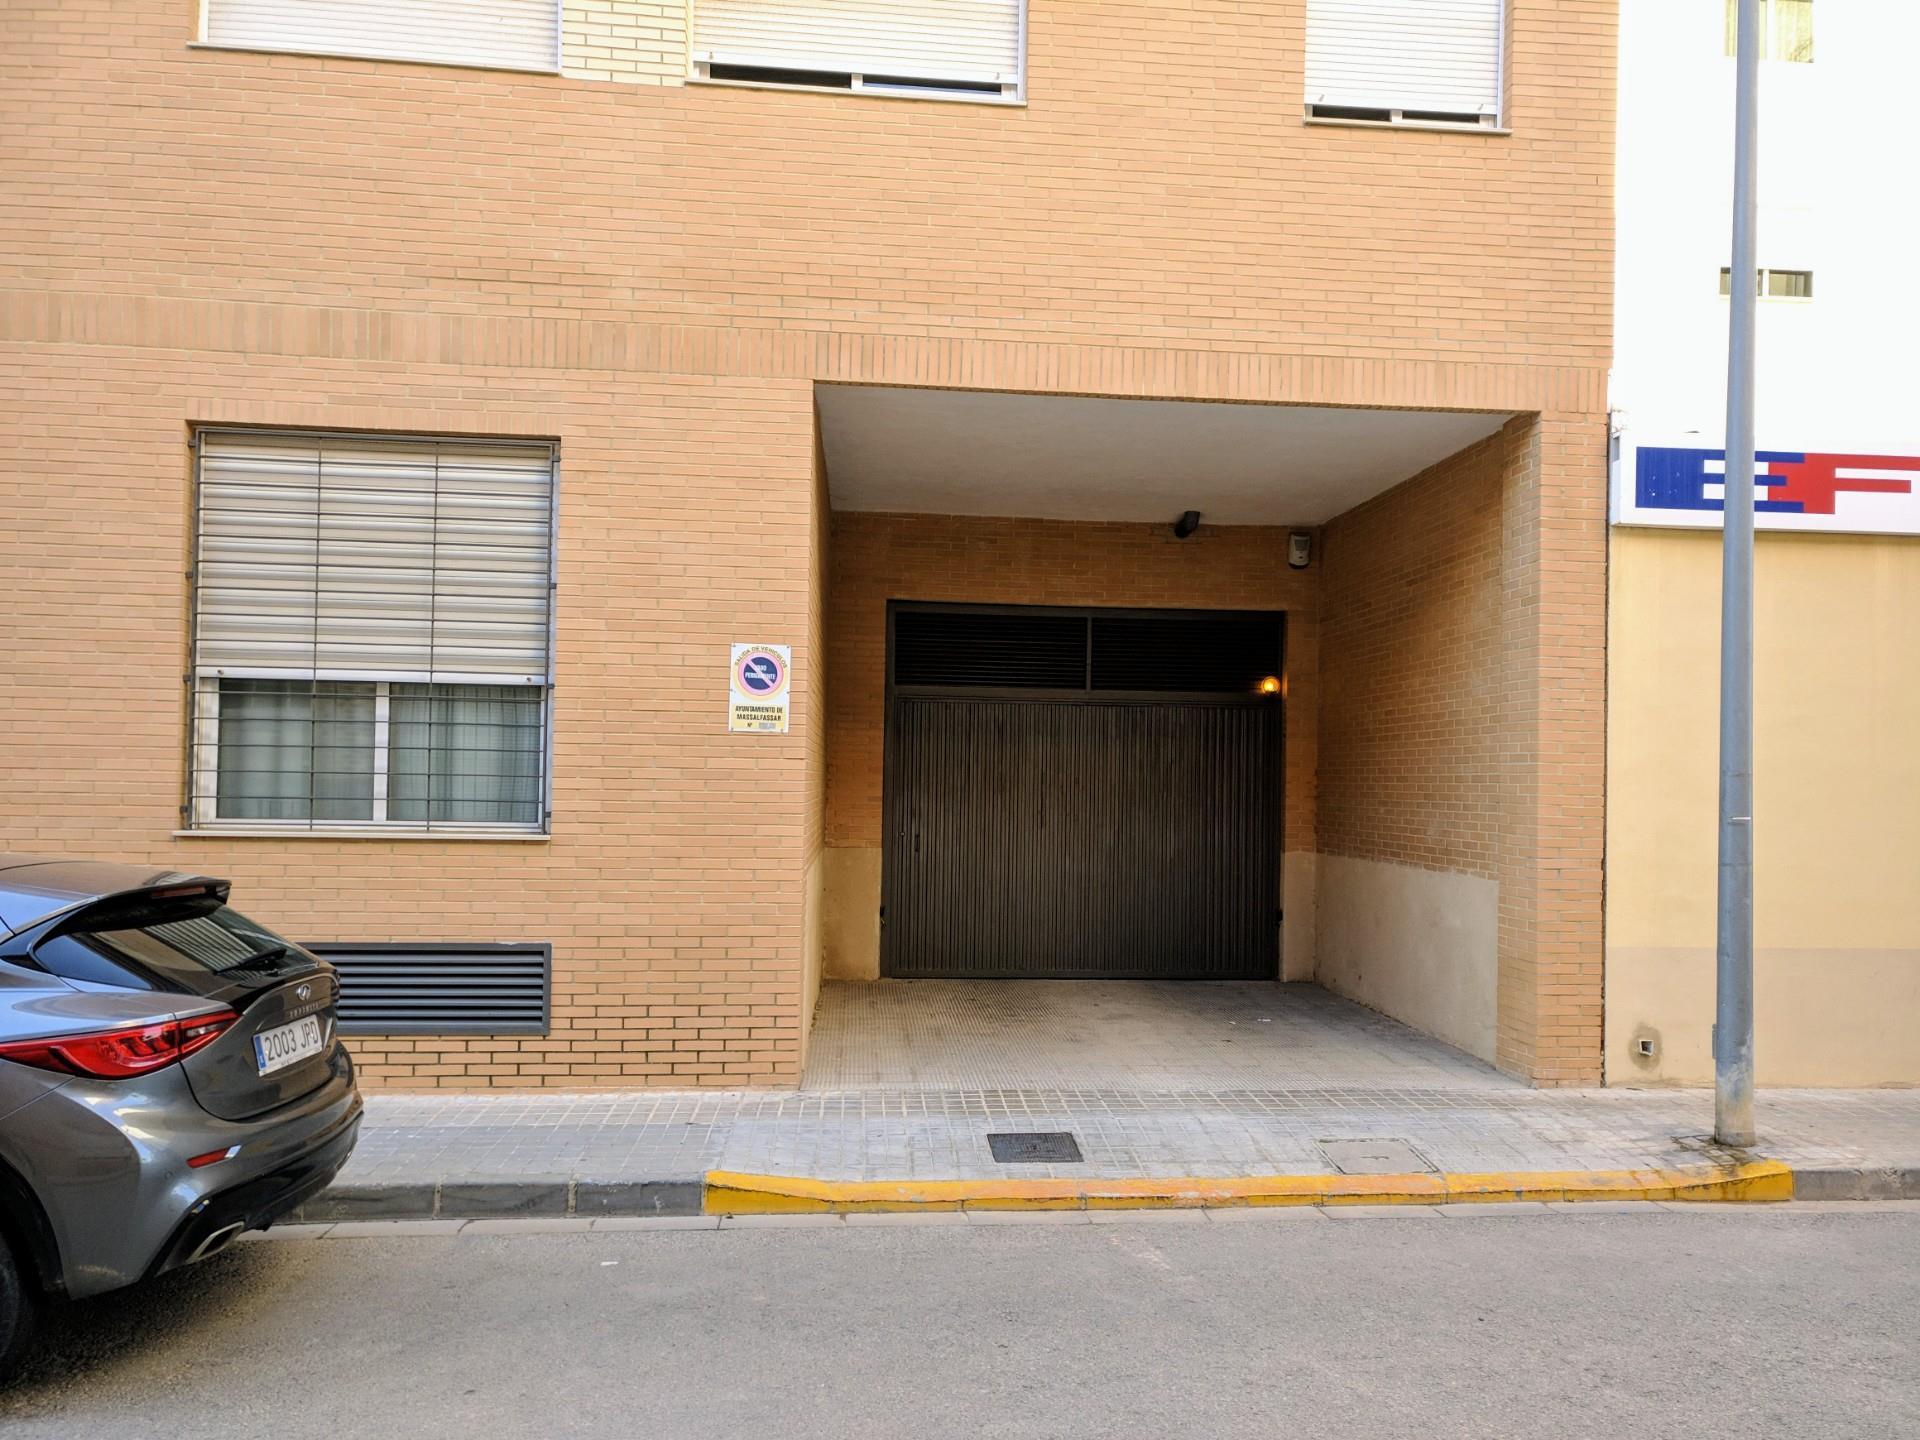 Parking voiture  Calle de mariano benlliure. Massalfassar / calle de mariano benlliure